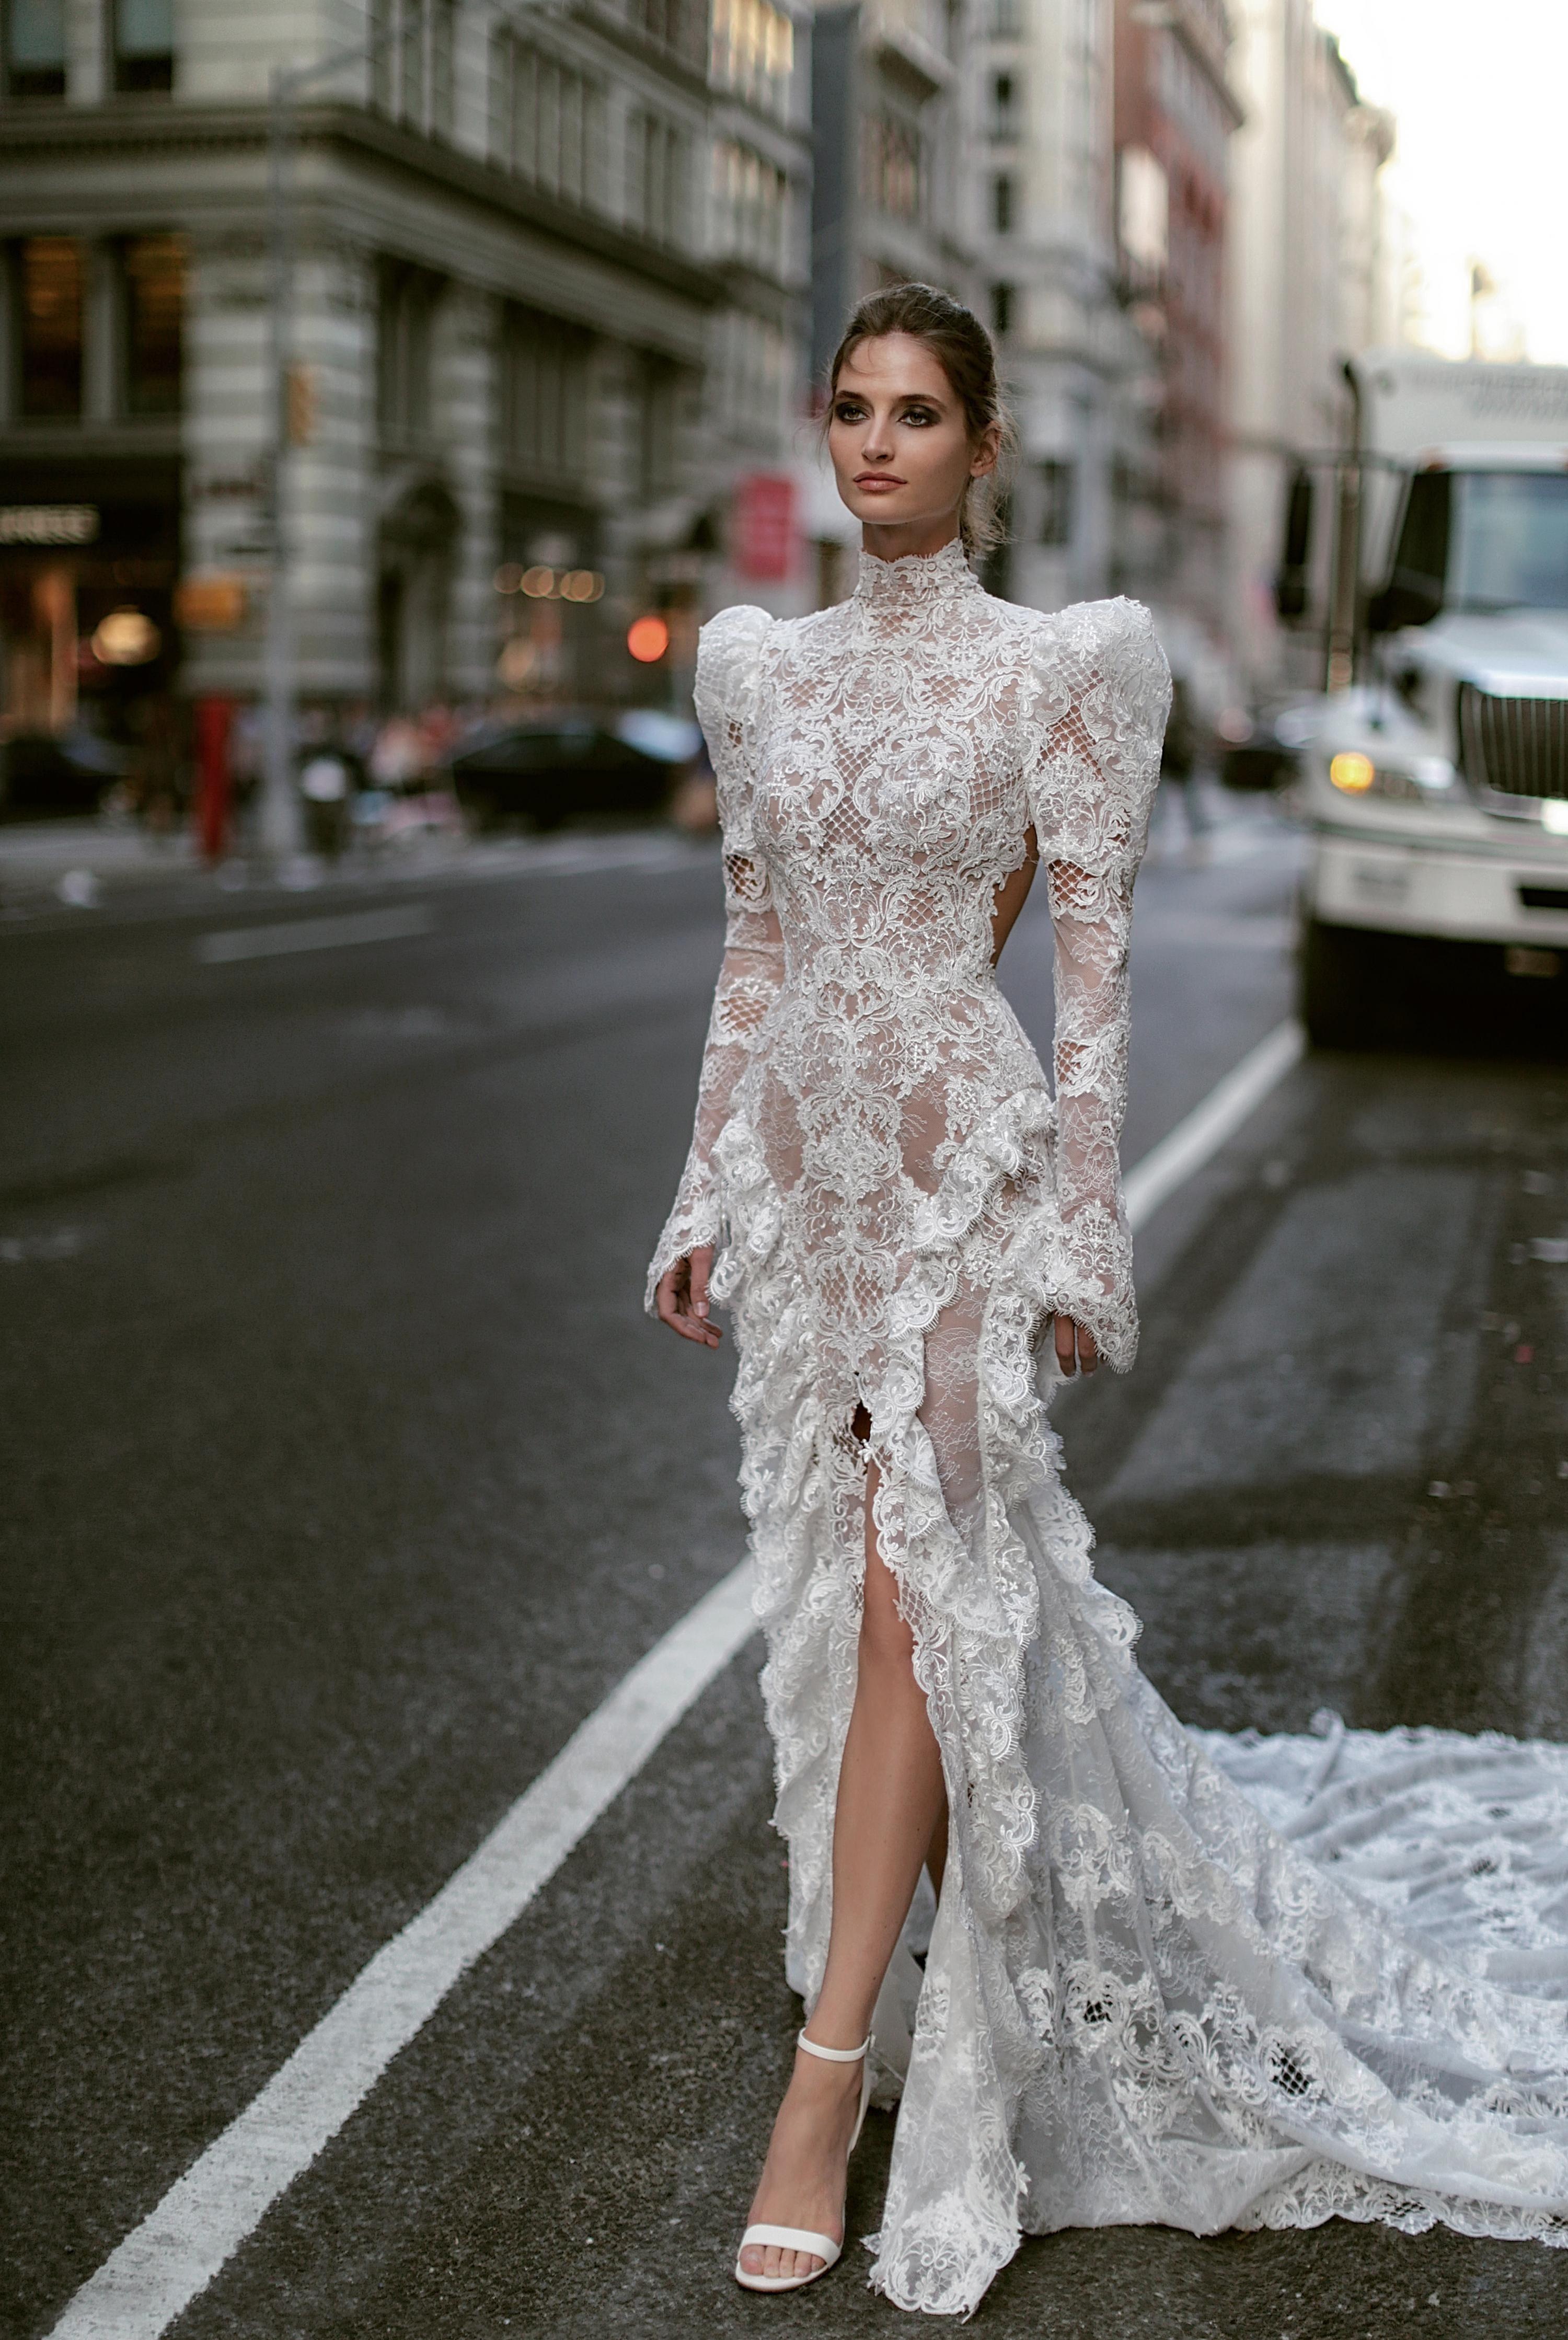 jaton couture   Gowns dresses, Designer wedding dresses, Perfect ...